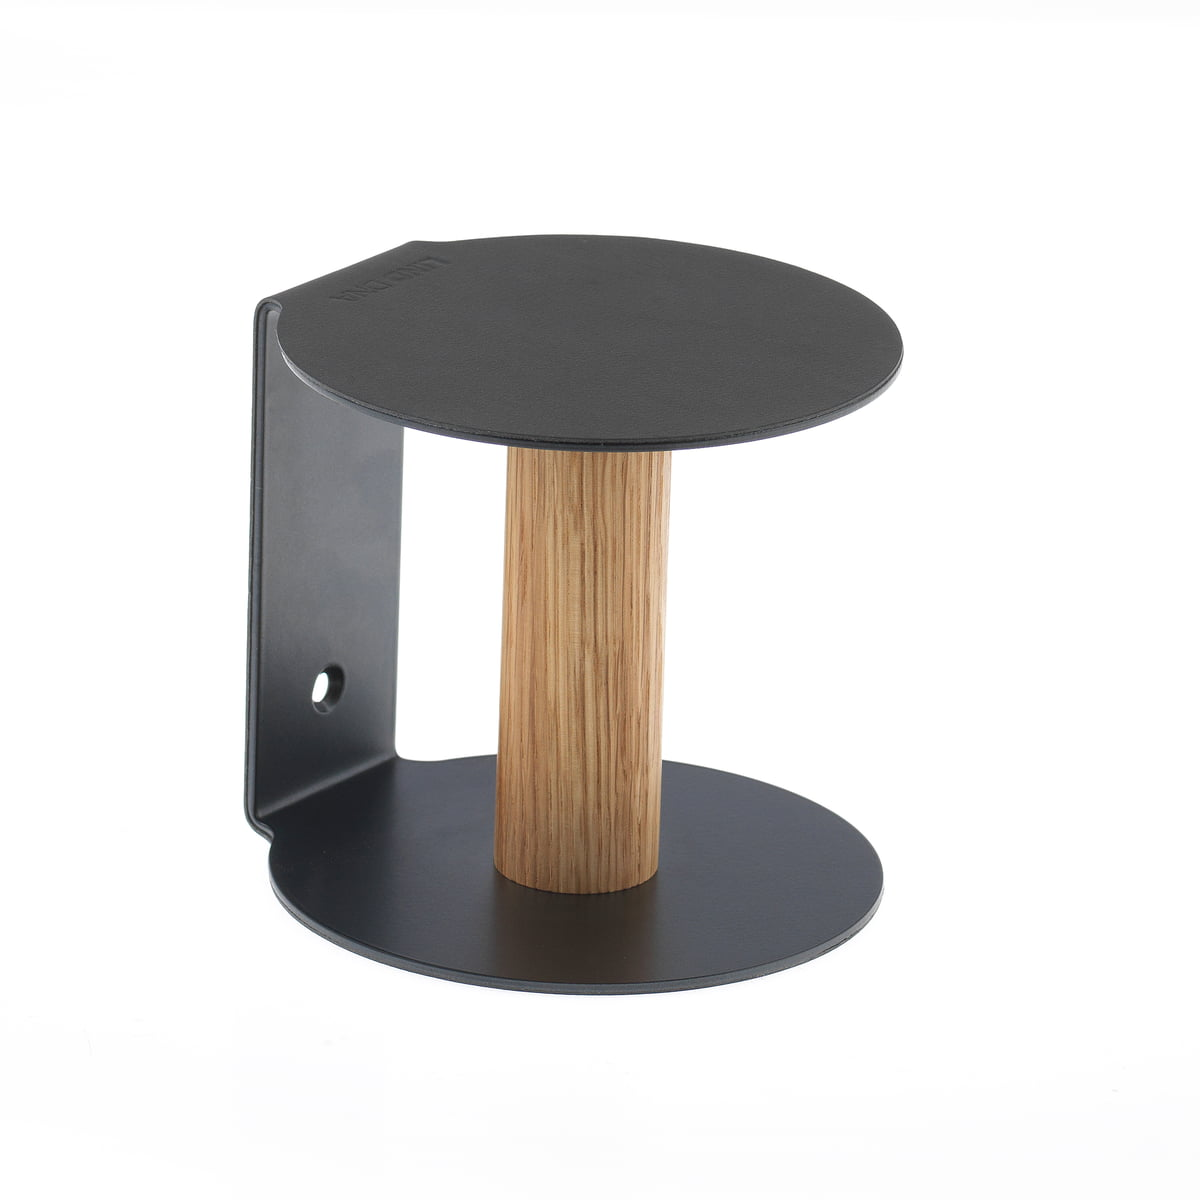 Toilet Paper Holder By LindDNA In Black Nupo / Steel Black